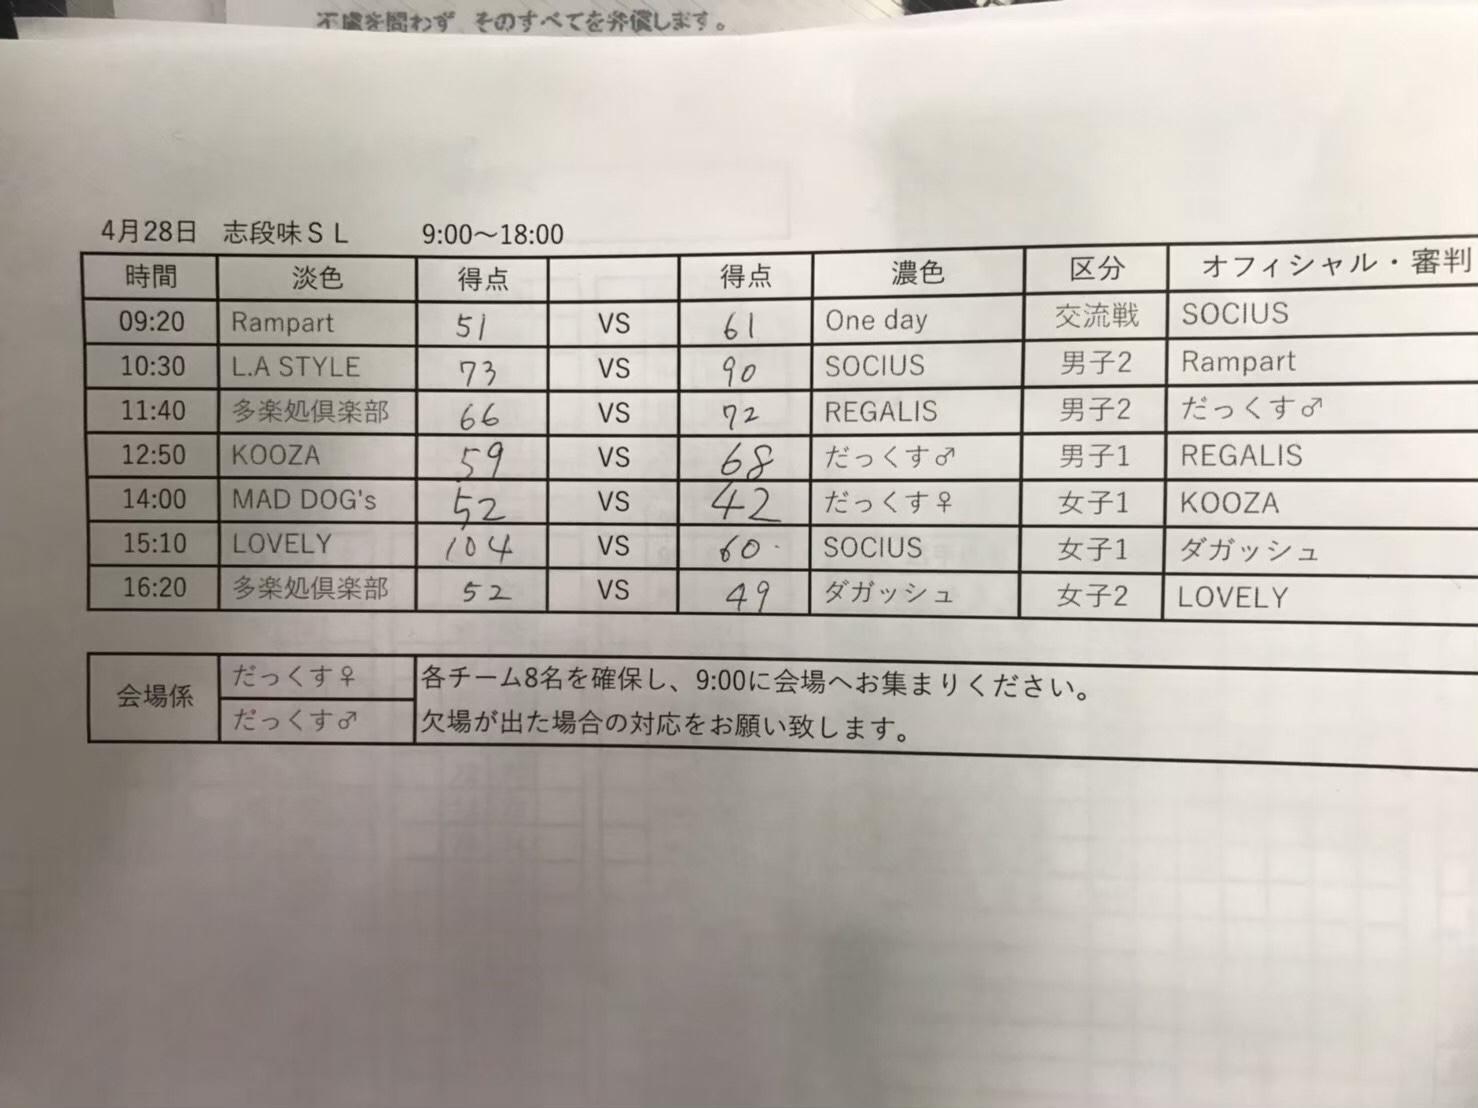 4A7417AC-5398-4B1D-A136-A18FF051673B